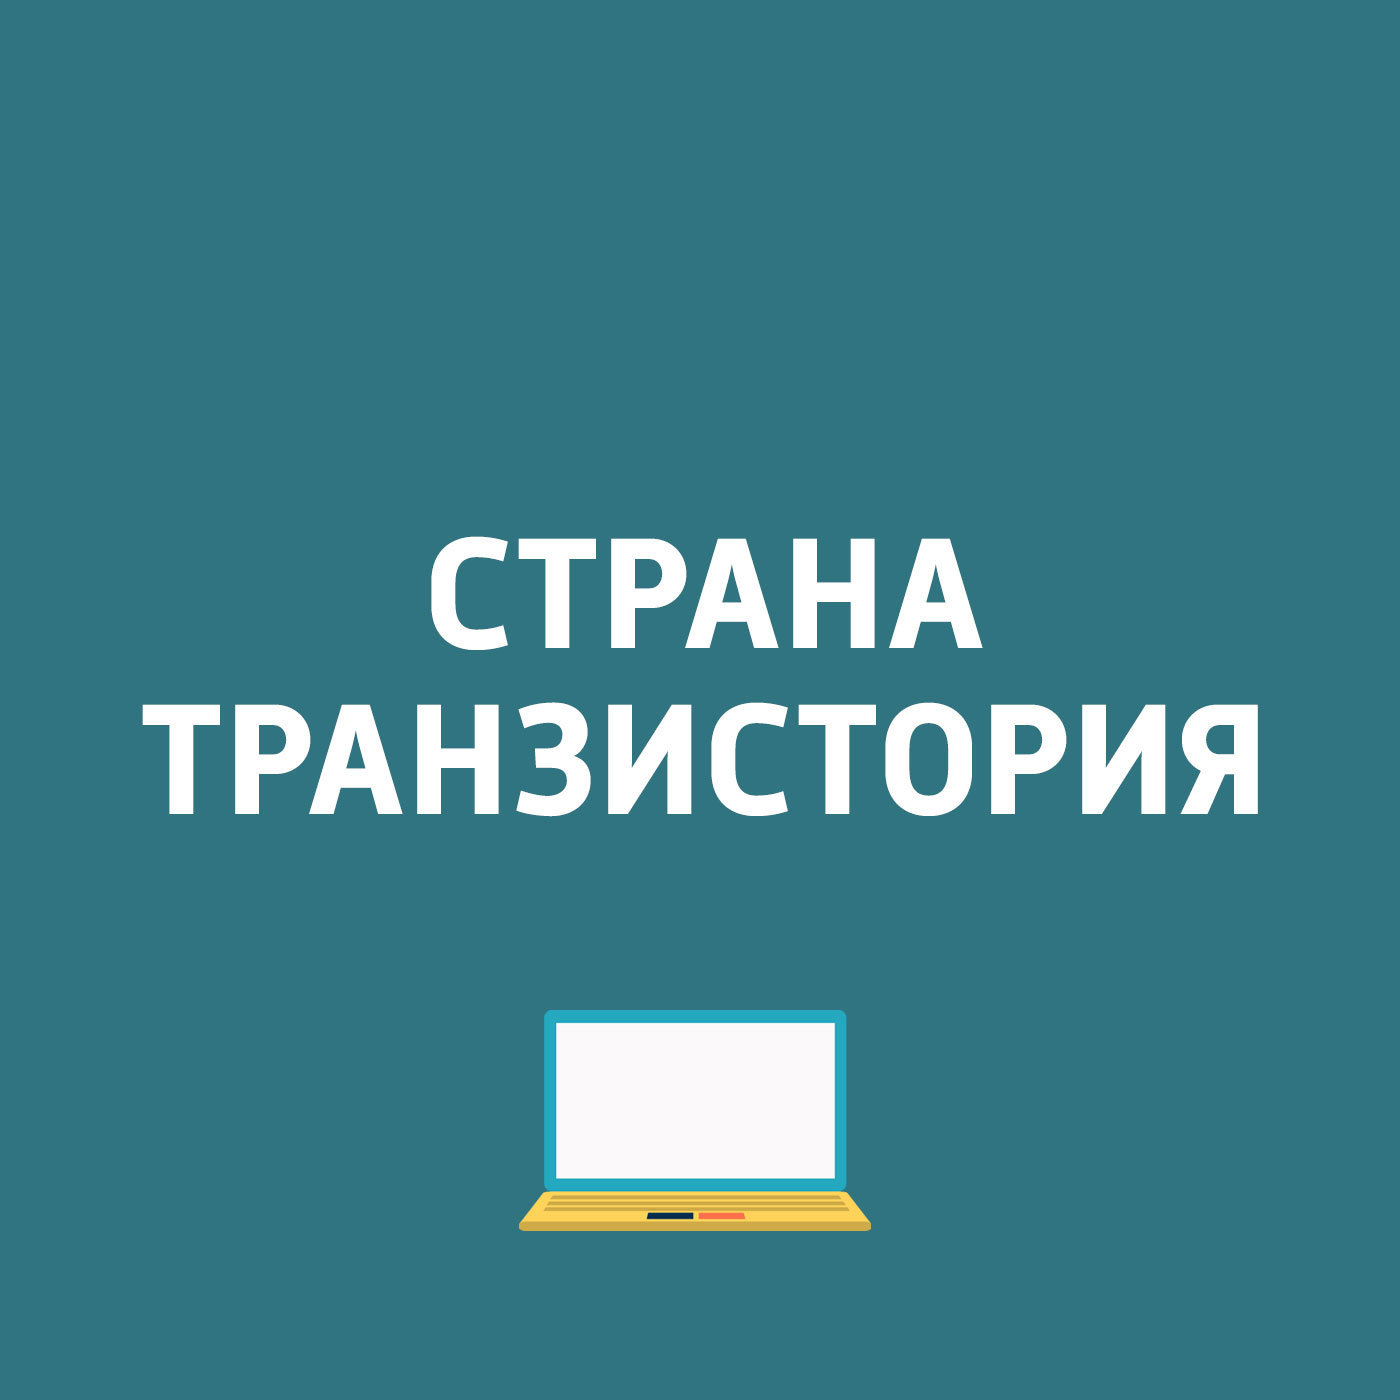 Картаев Павел AliExpress меняет правила доставки товаров; Обзор игр... картаев павел чуррос